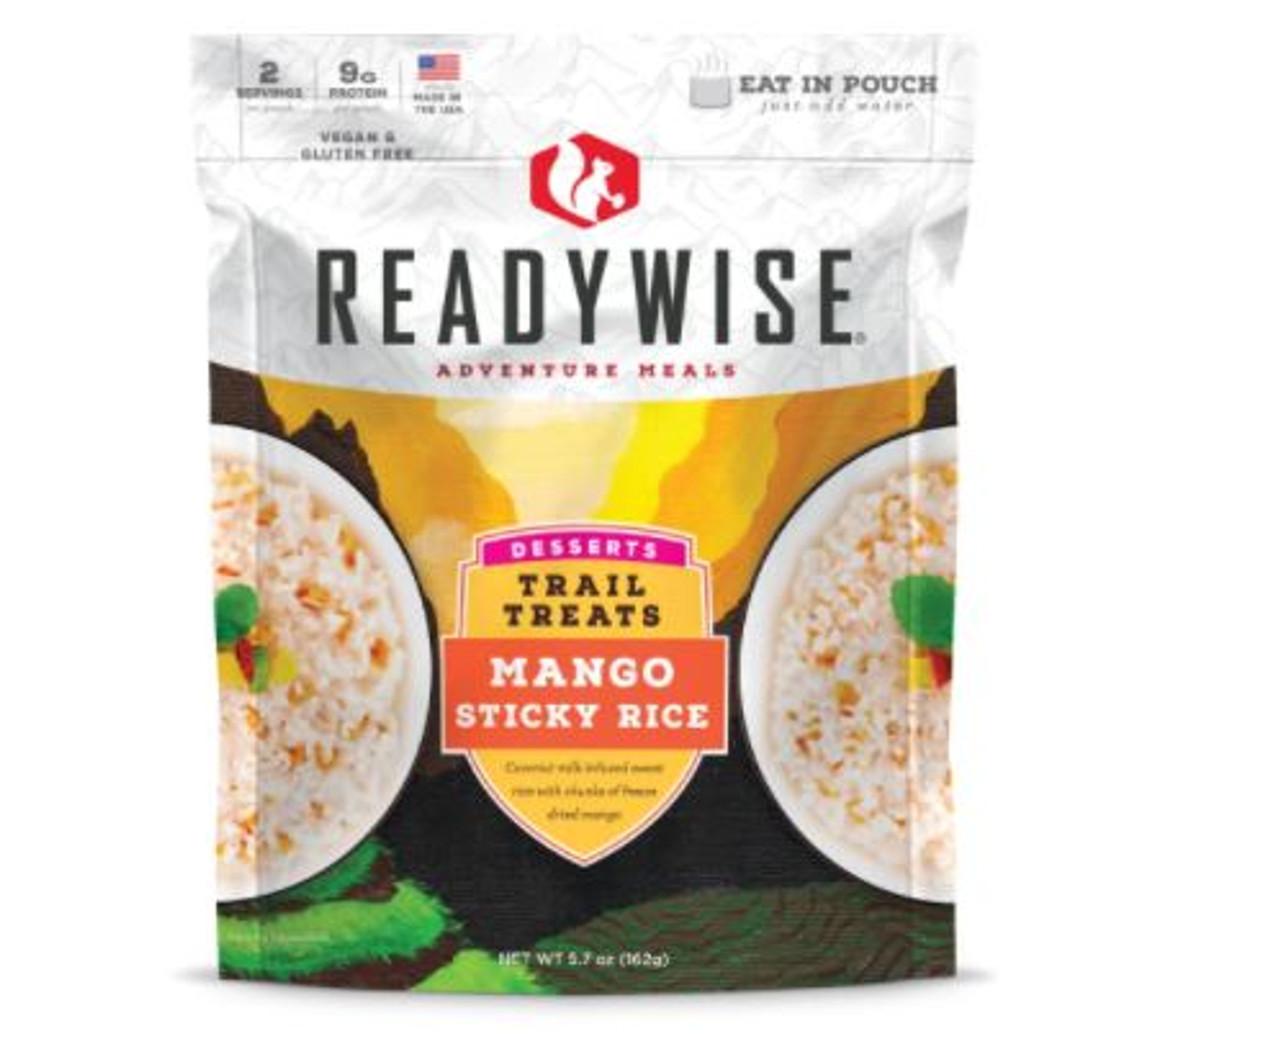 Wise Trail Treats Mango Sticky Rice